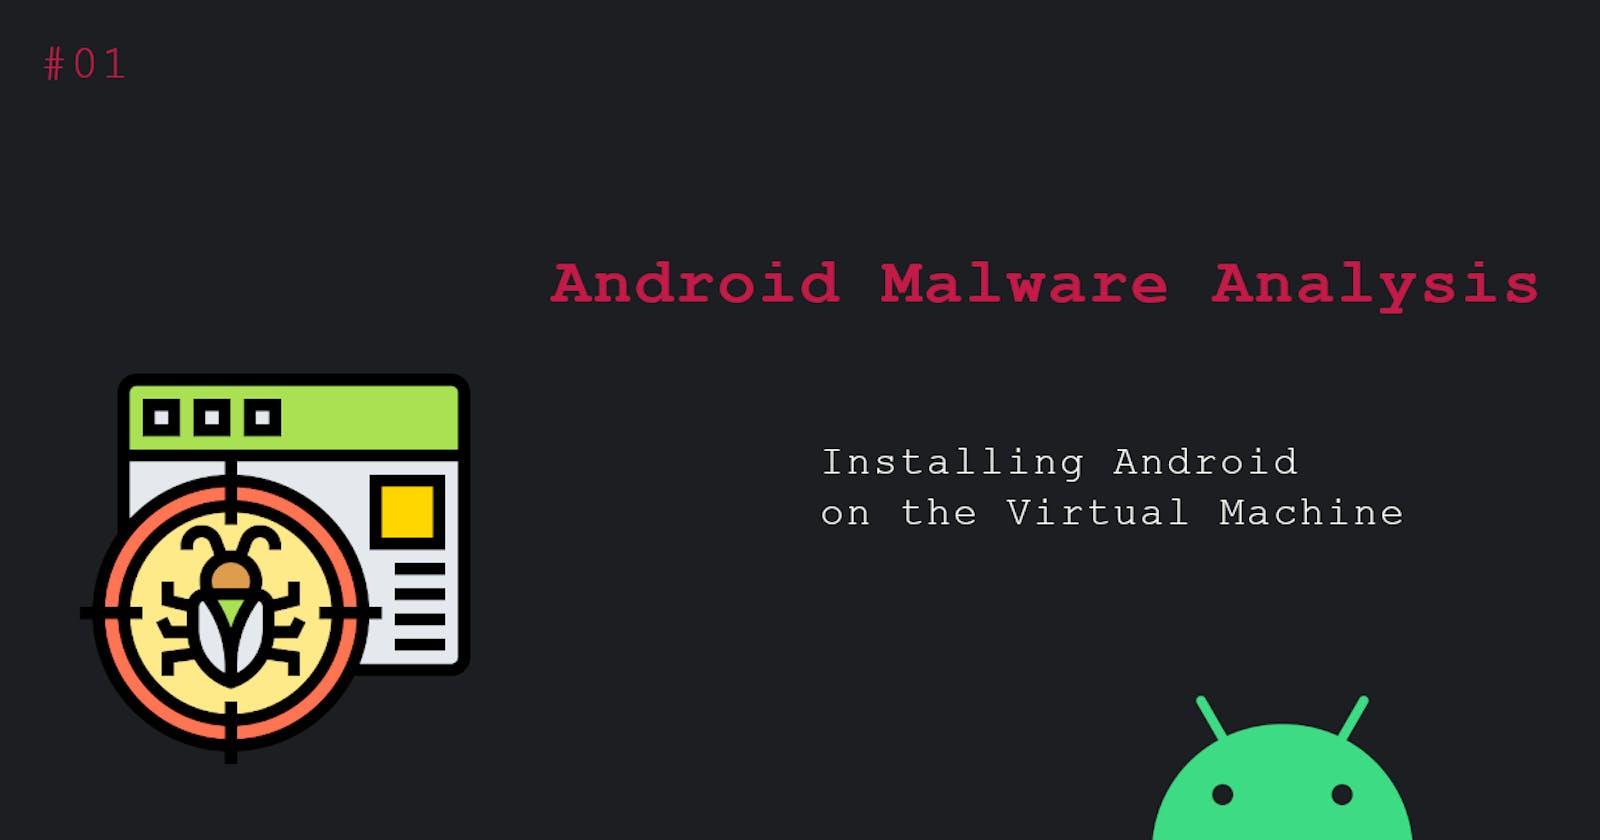 Android malware analysis: preparation